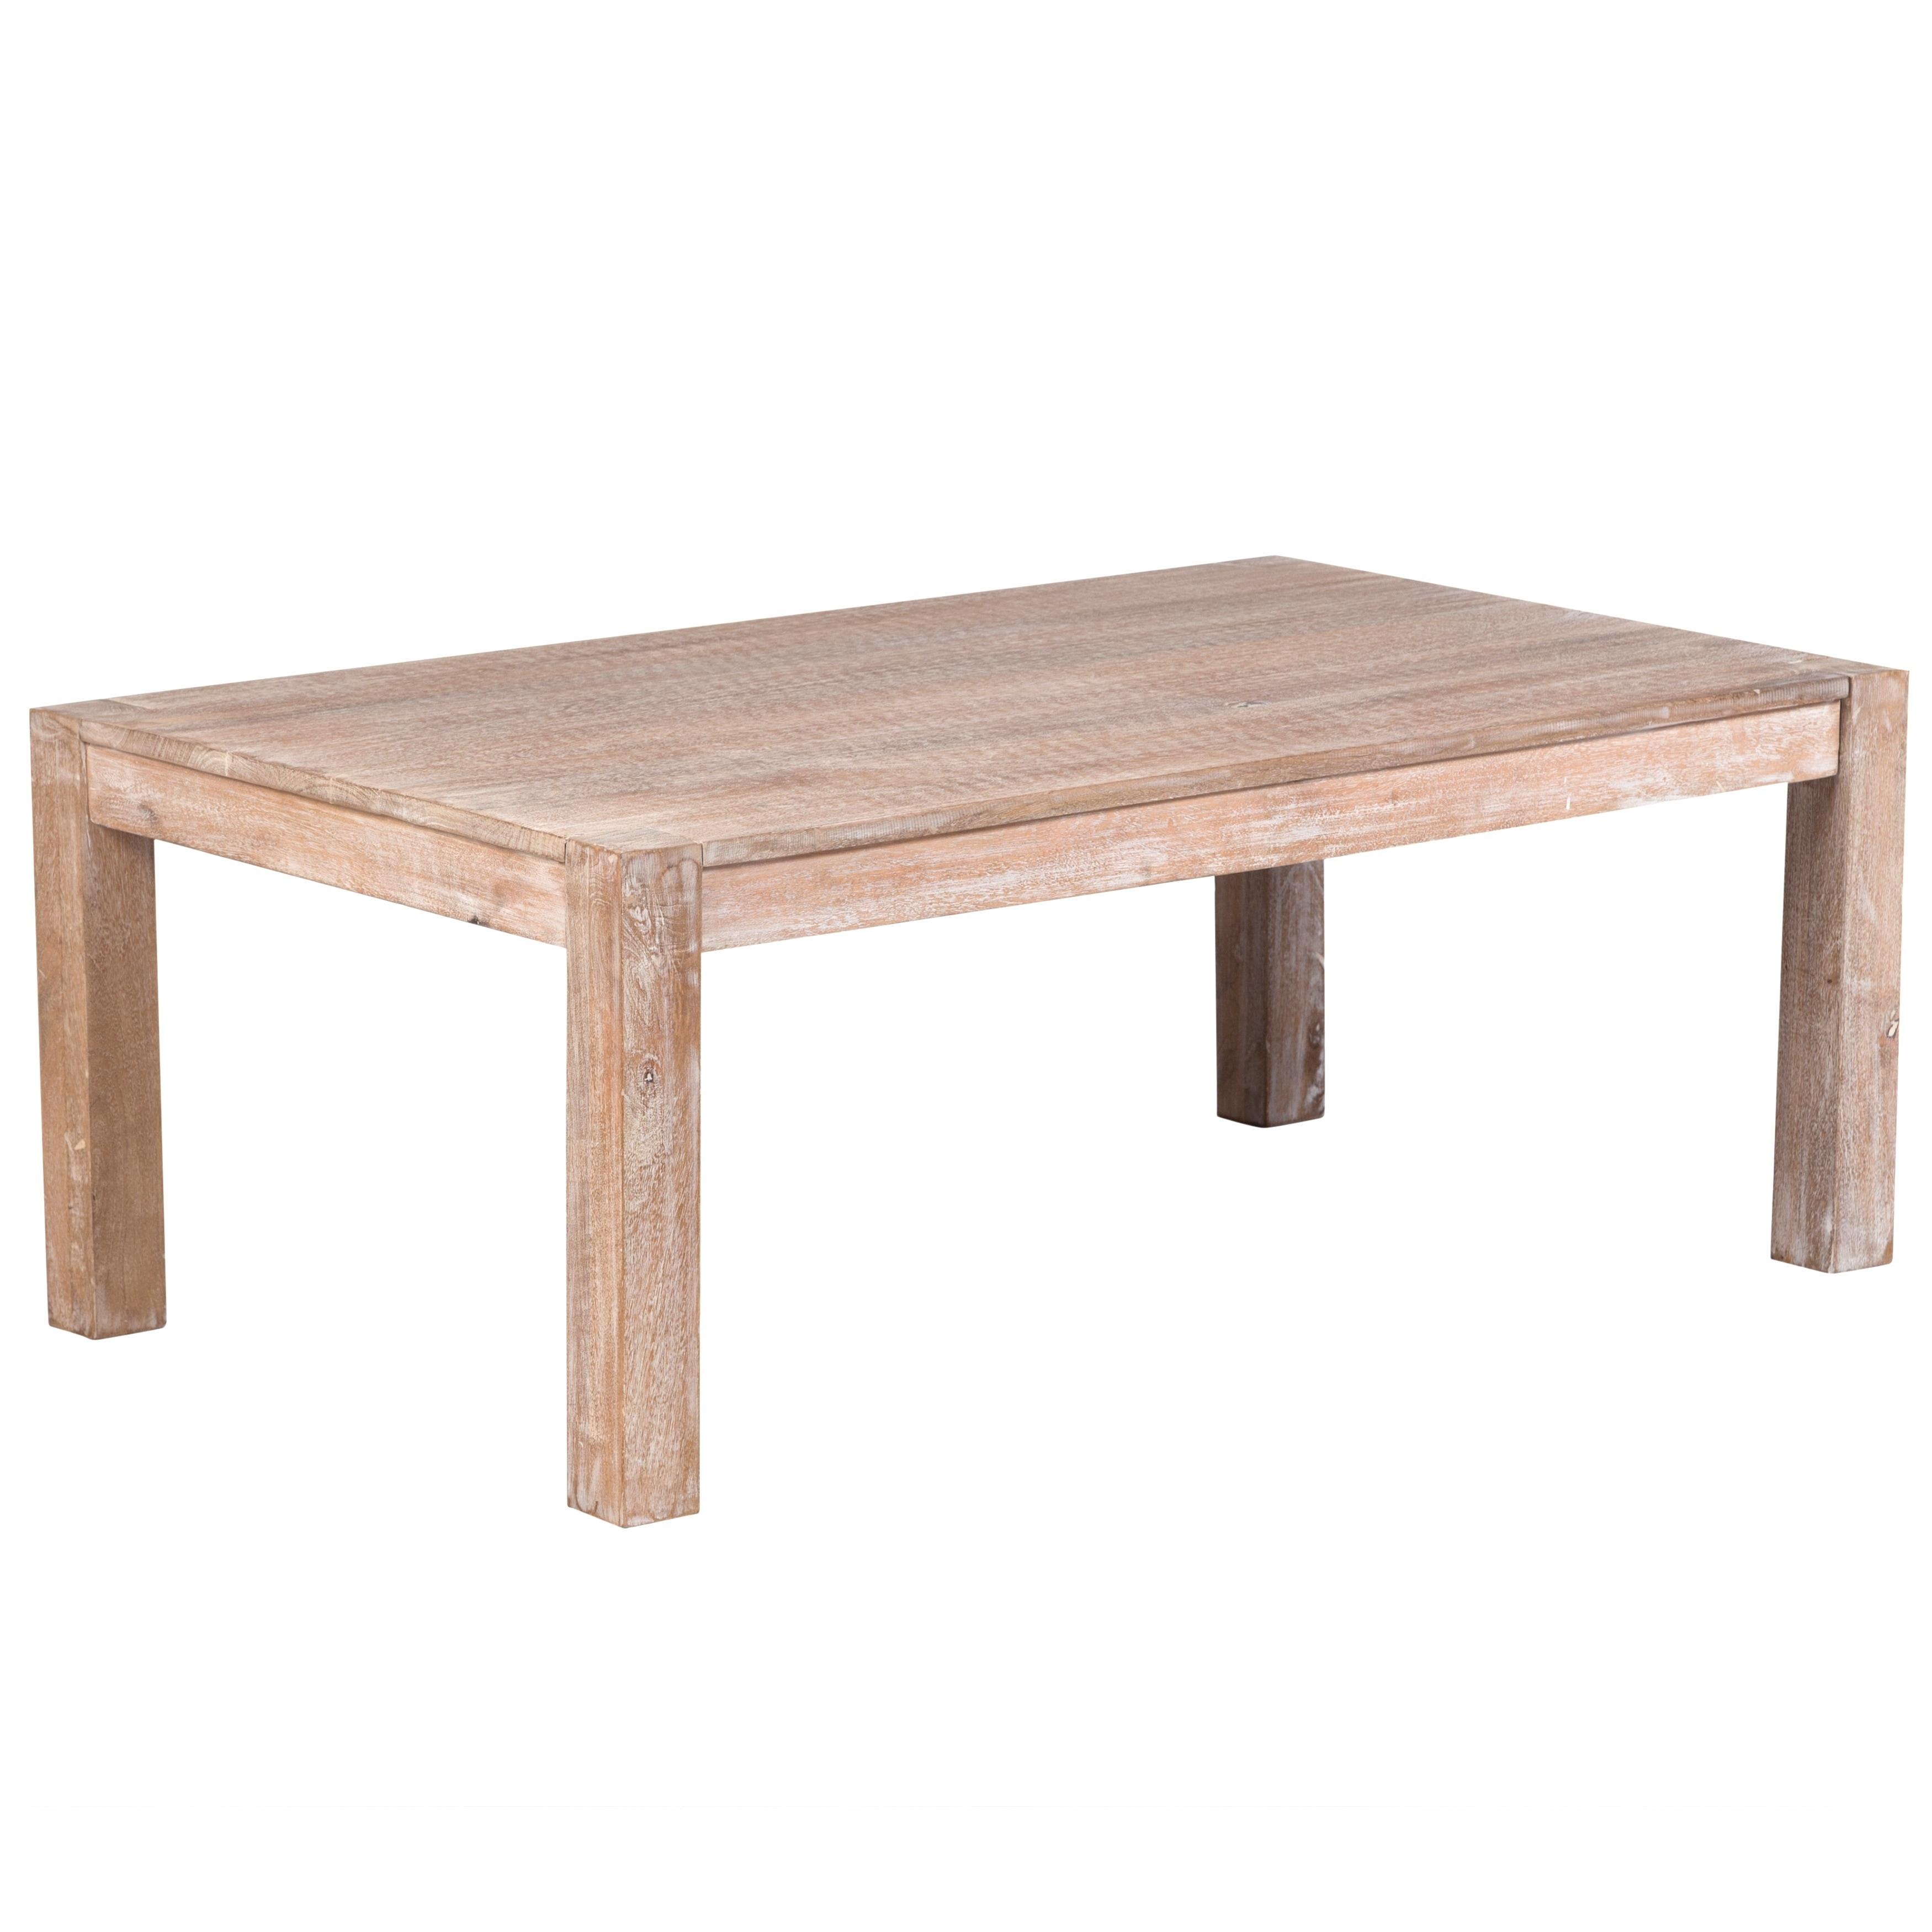 Wanderloot Manhattan White Wash Mango Wood Handmade Shabby Chic Coffee Table On Free Shipping Today 22538284